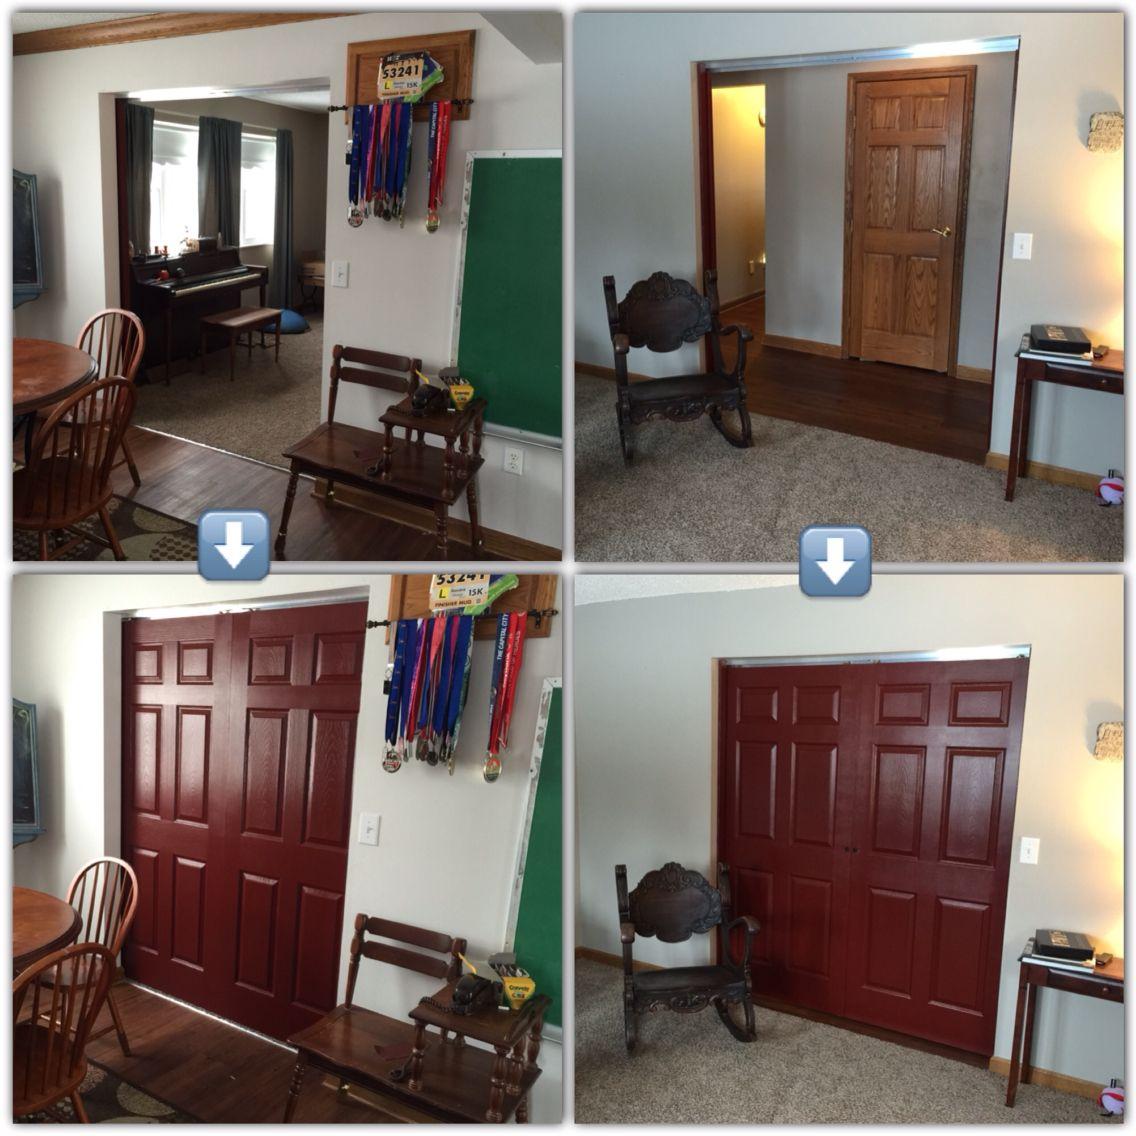 Barn door alternative wall mounted sliding doors now our living